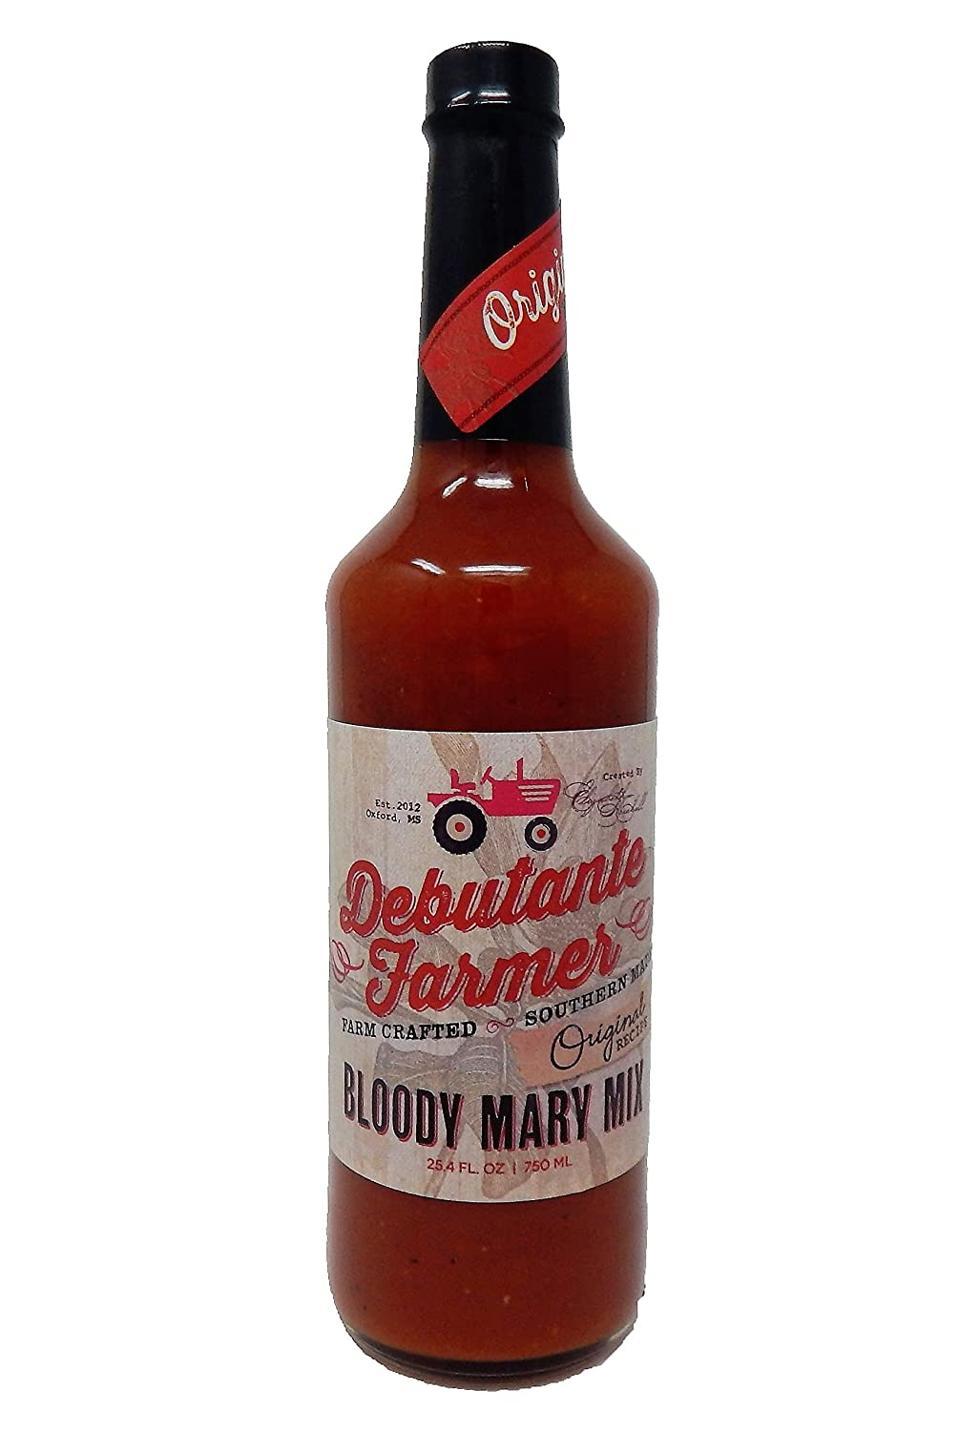 Debutante Farmer Bloody Mary Mix